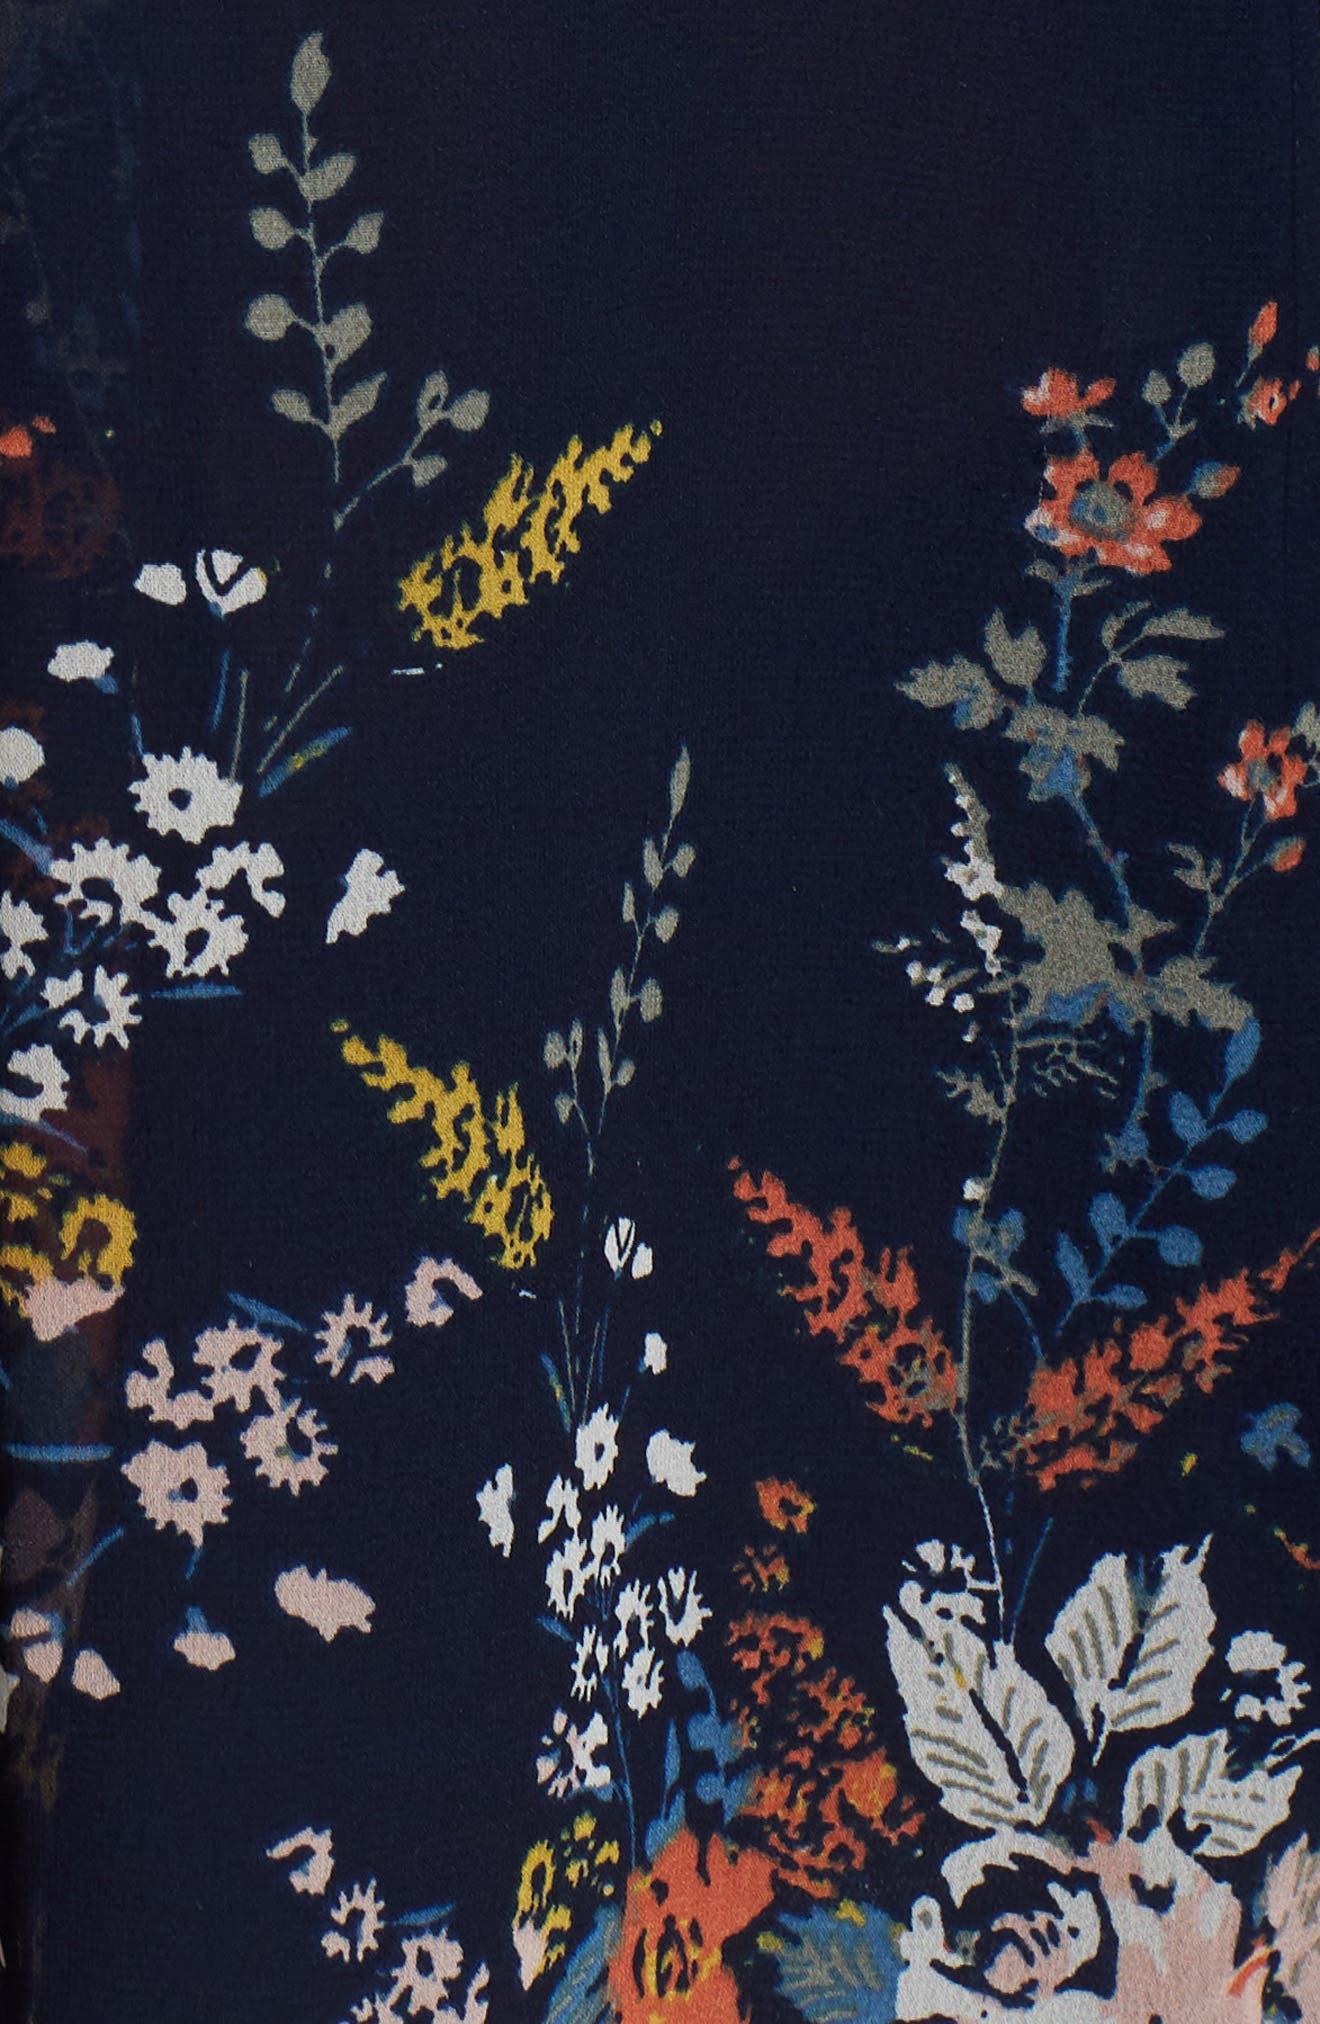 Cold Shoulder Floral Top,                             Alternate thumbnail 5, color,                             Navy Multi